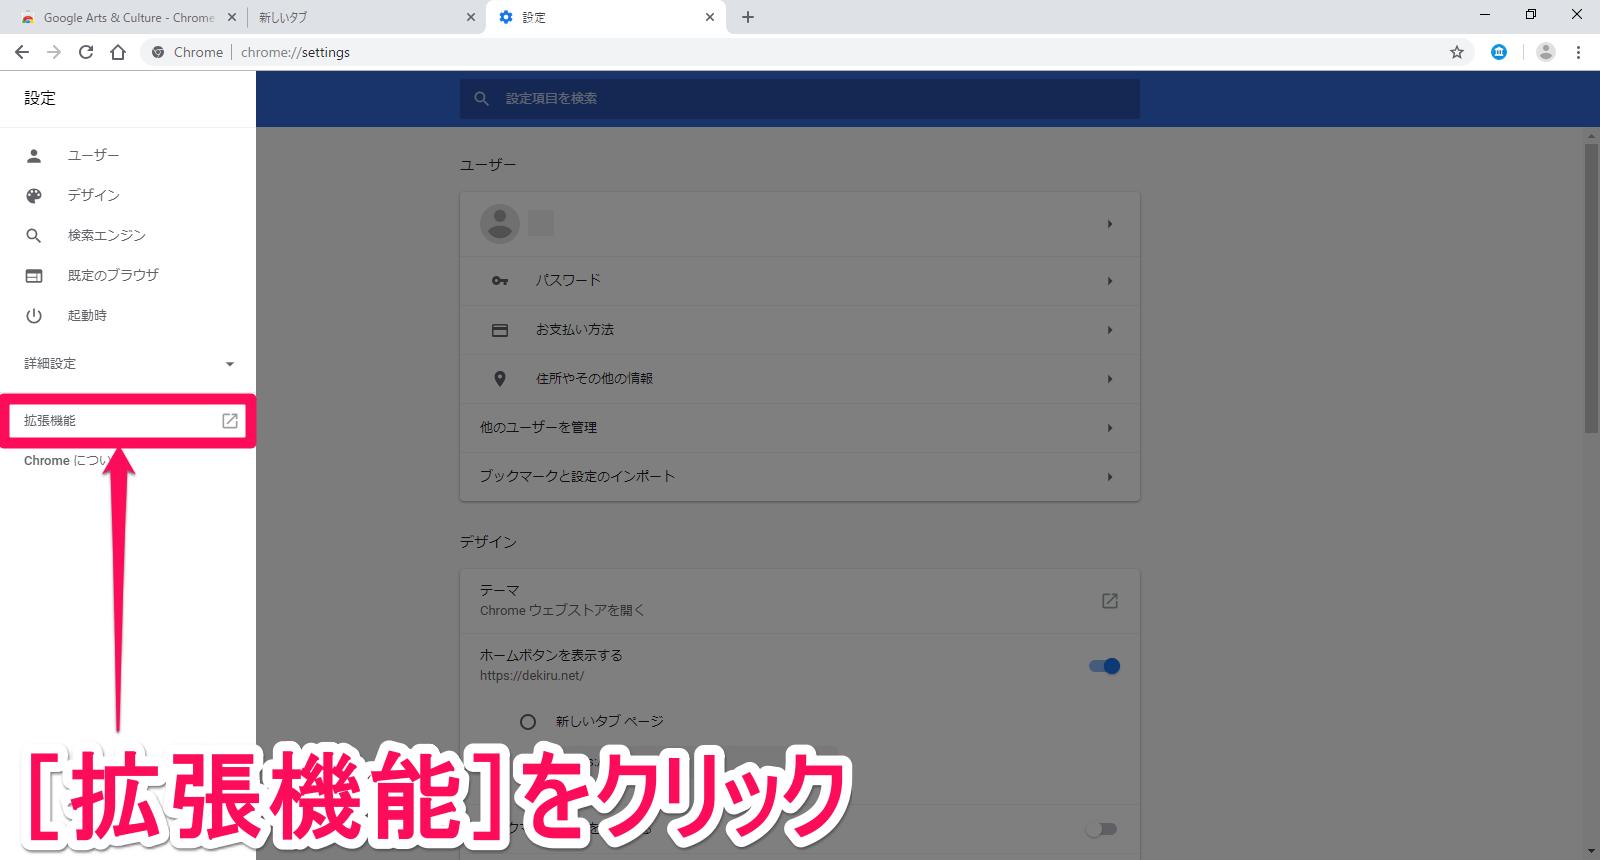 Chrome(クローム)の[設定]画面のメインメニュー画面